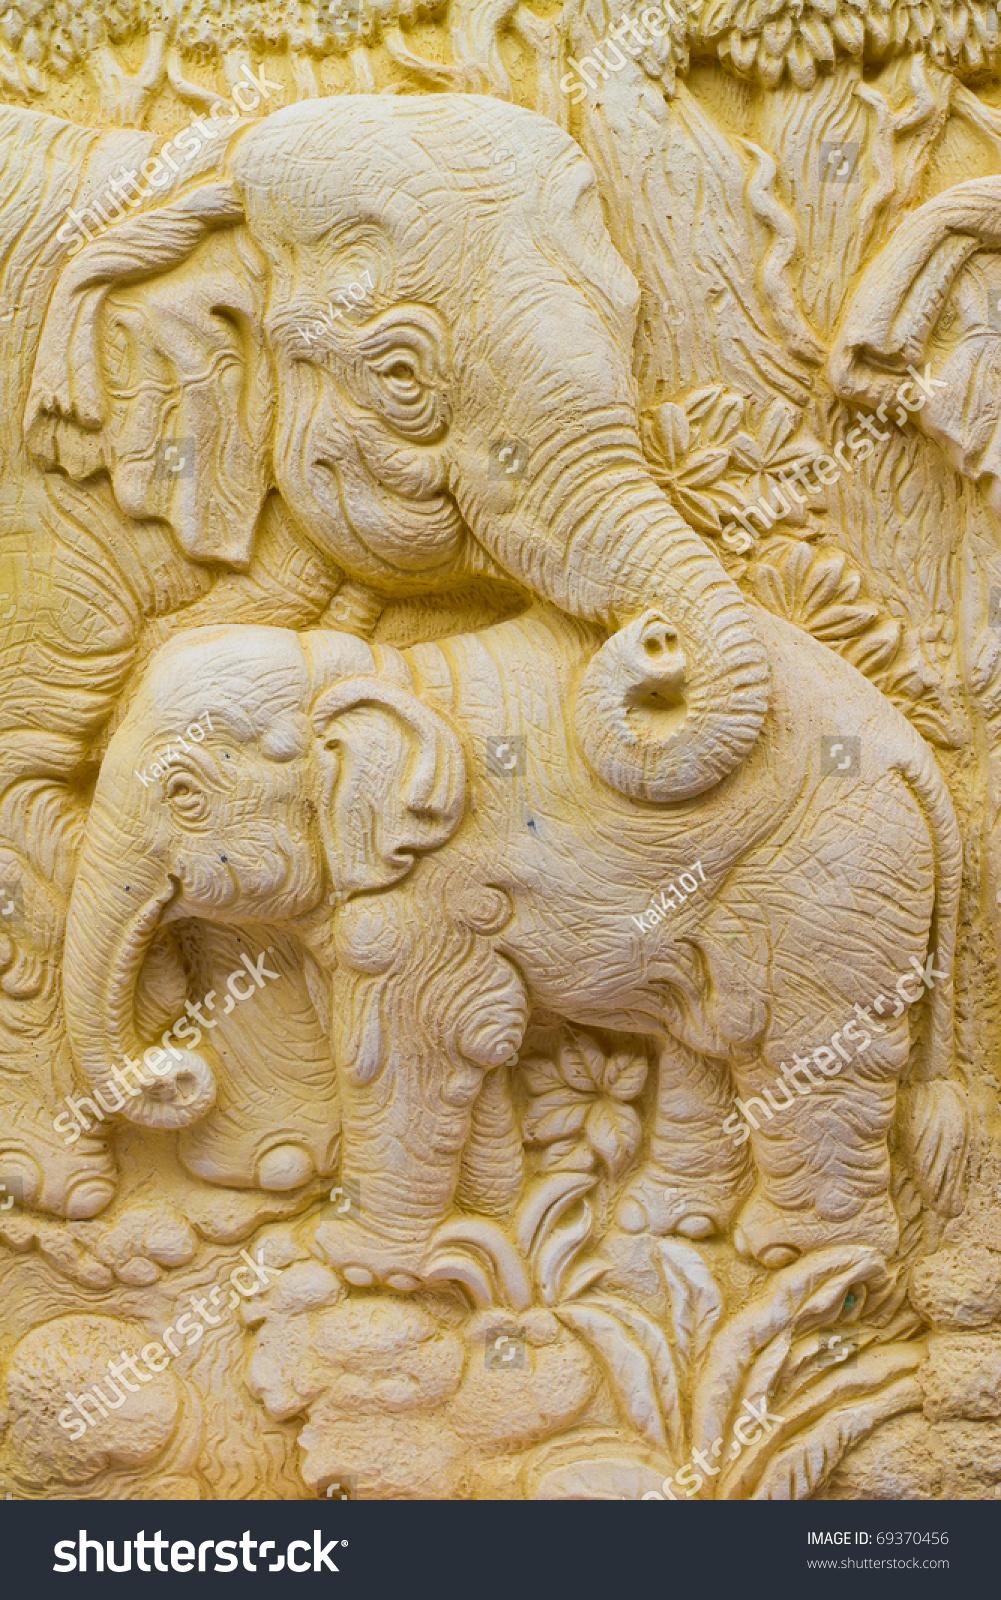 Enchanting Wall Relief Art Images - Art & Wall Decor - hecatalog.info